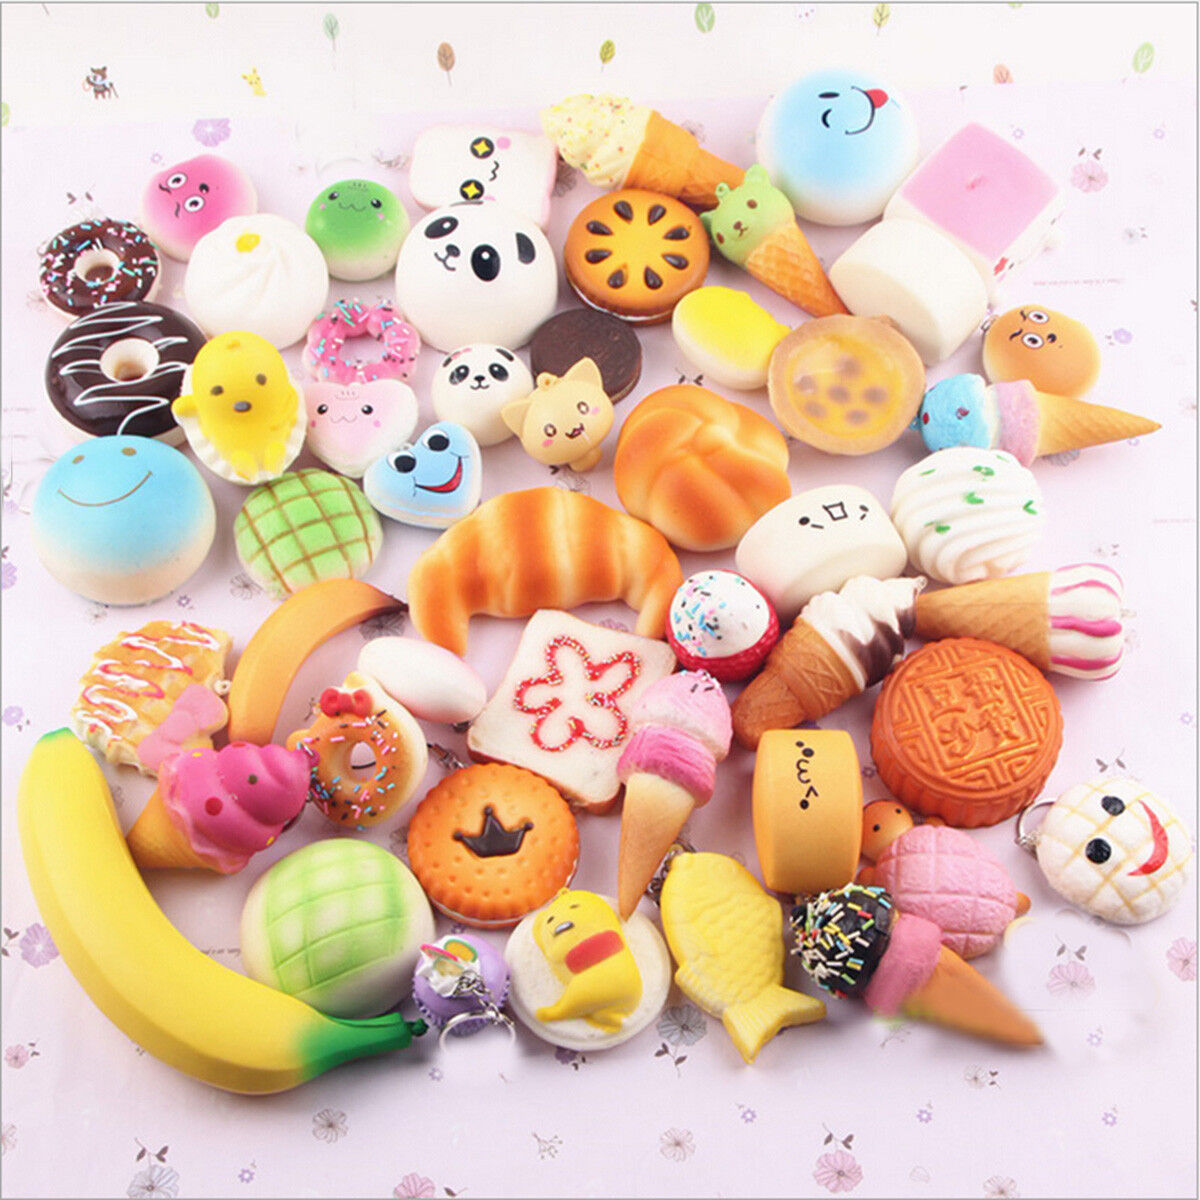 Squishy Mini Bun : 20Pcs Jumbo Medium Mini Random Squishy Soft Panda Bread Cake Buns Phone Straps